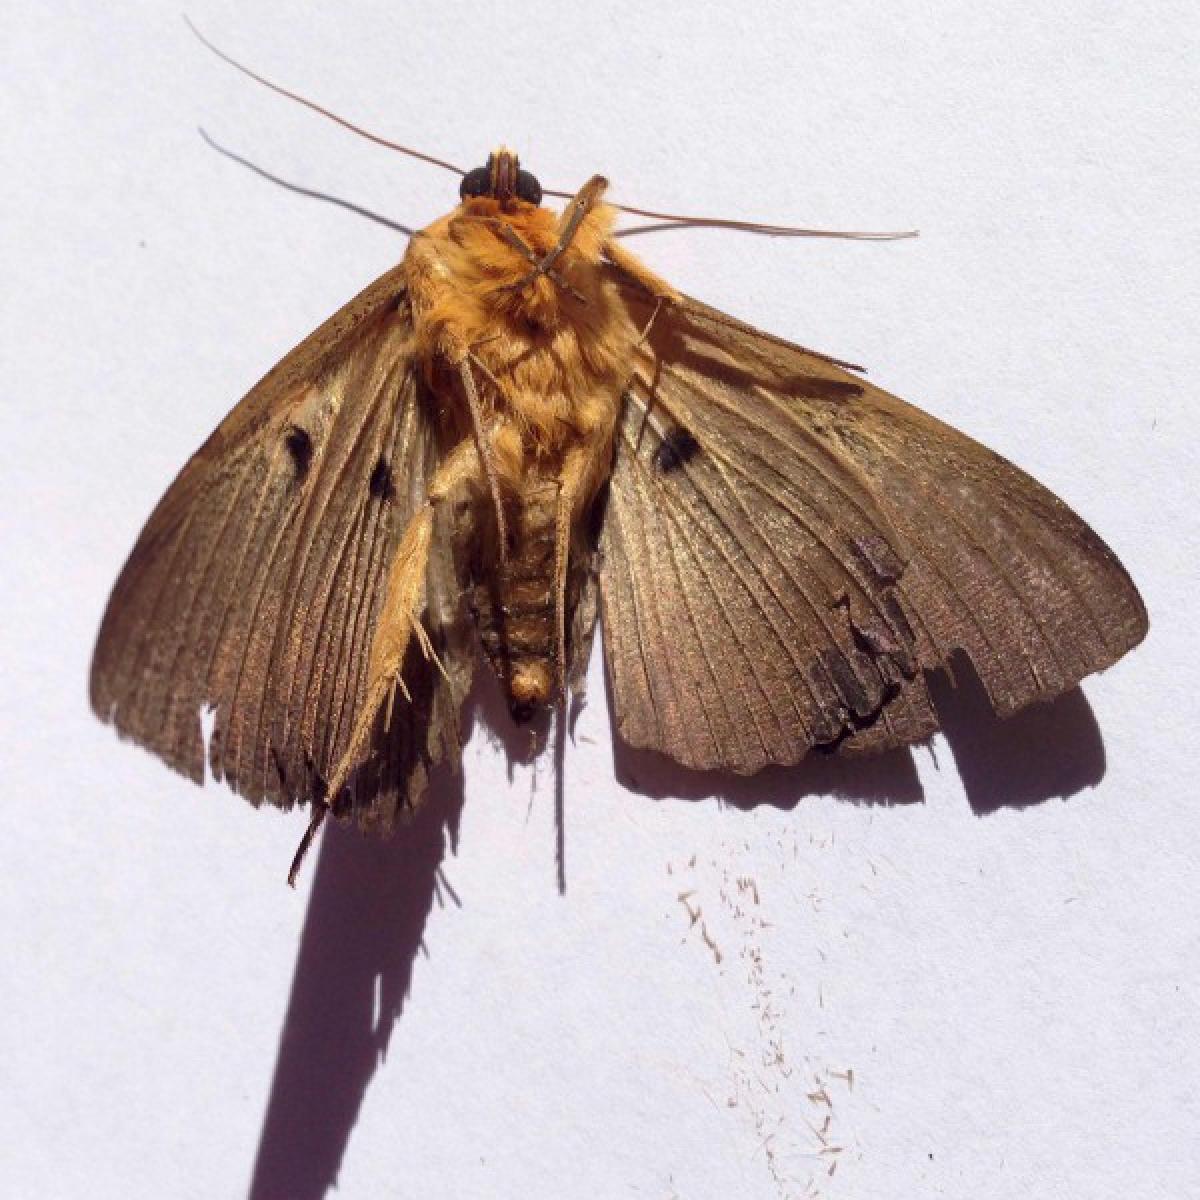 Moth - Dasypodia selevnophora (underside)